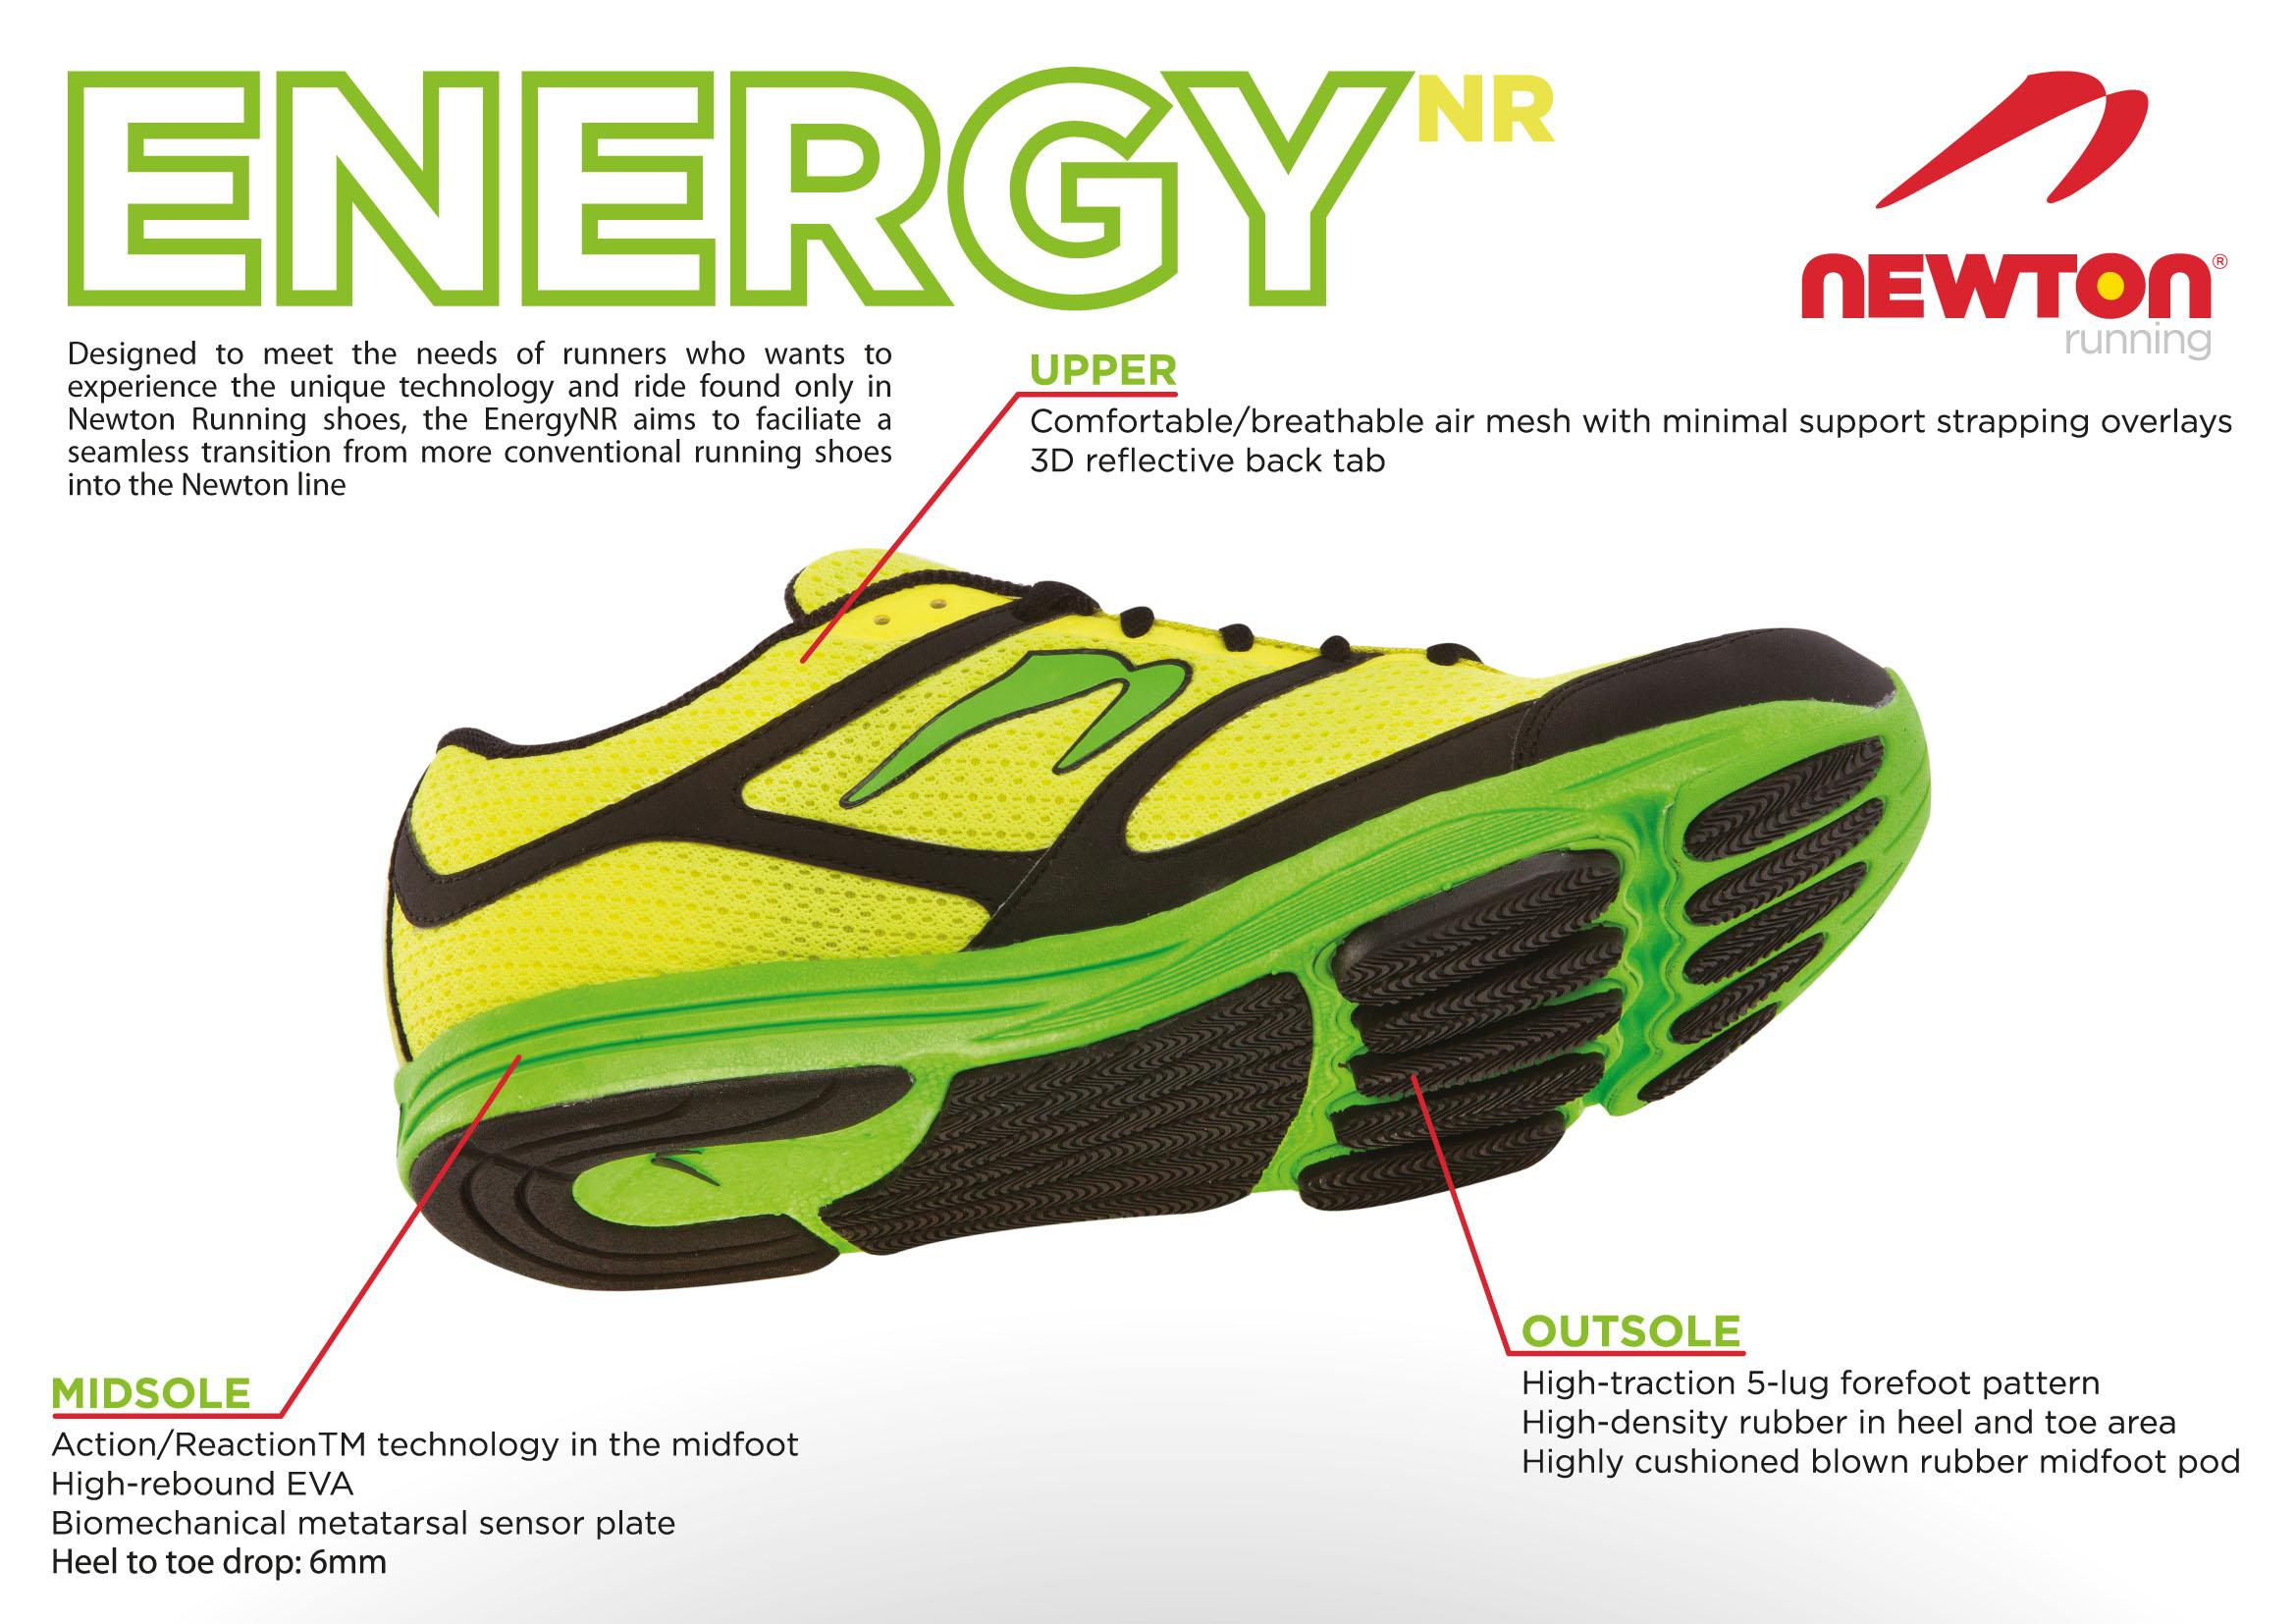 Newton Energy NR racing flats